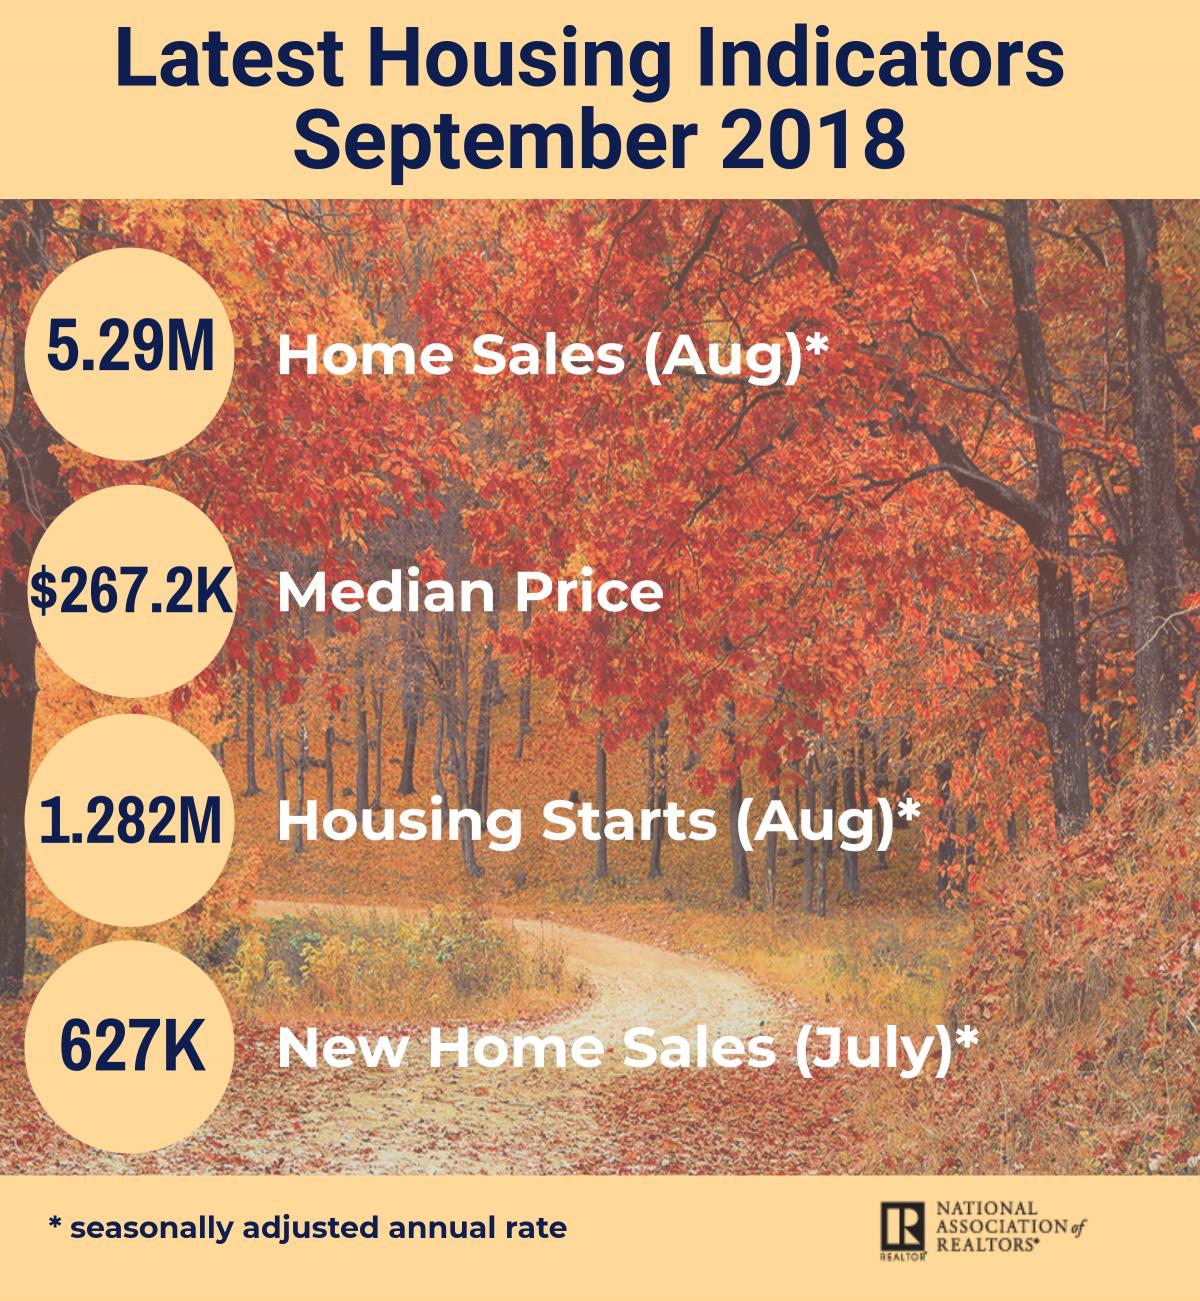 September 2018 Housing Indicators Infographic